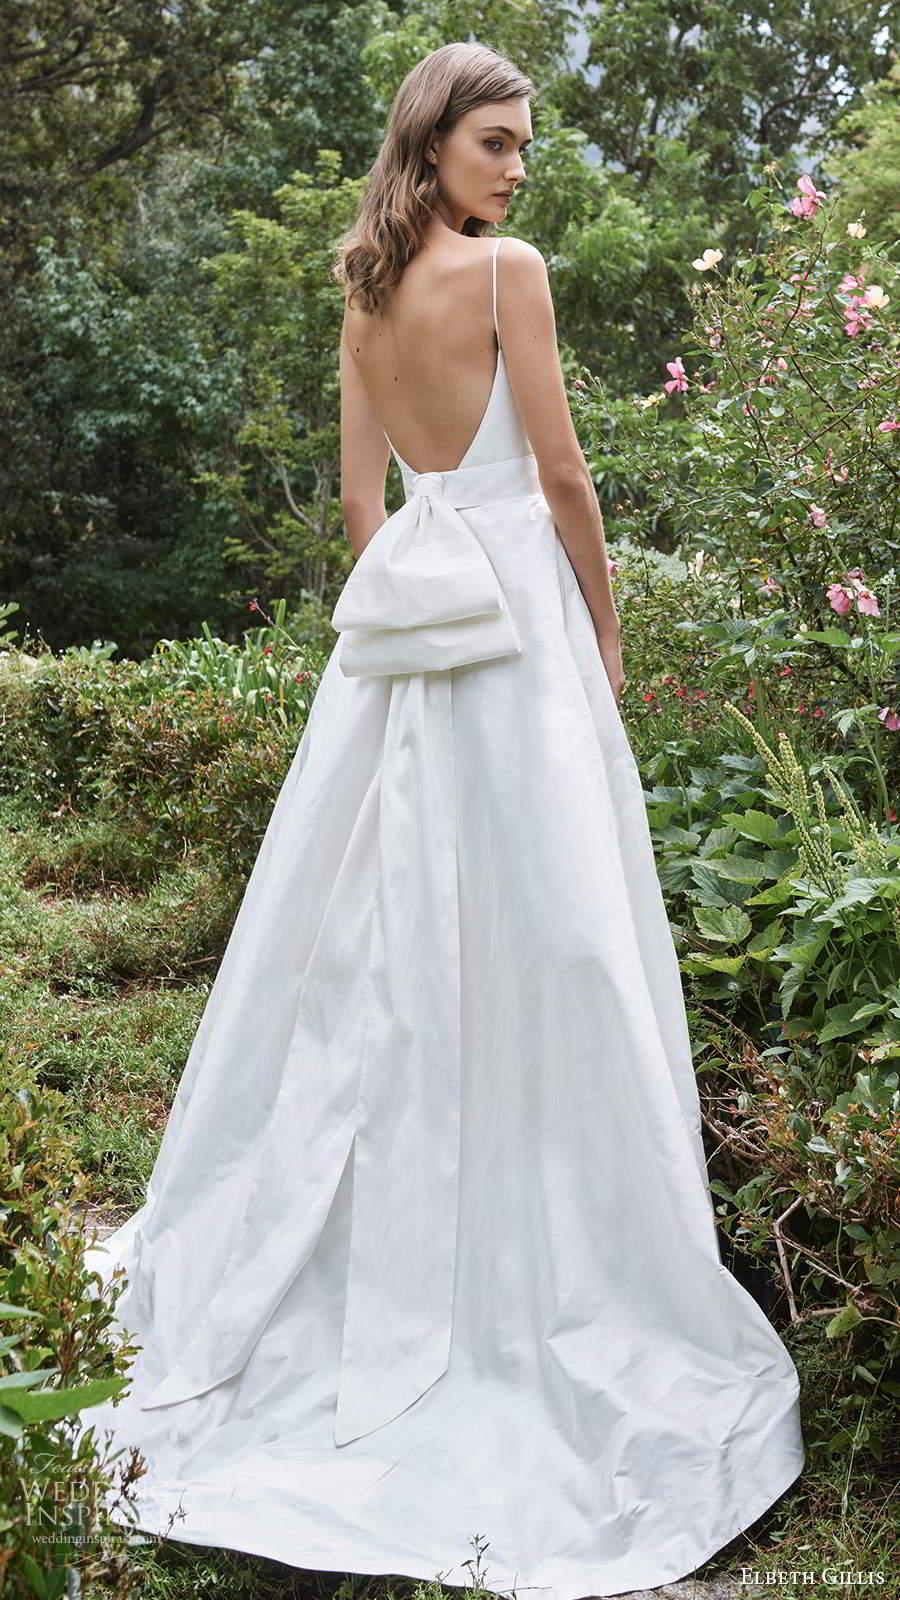 elbeth gillis 2021 bridal sleeveless straps v neckline embellished bodice a line ball gown wedding dress chapel train (12) bv